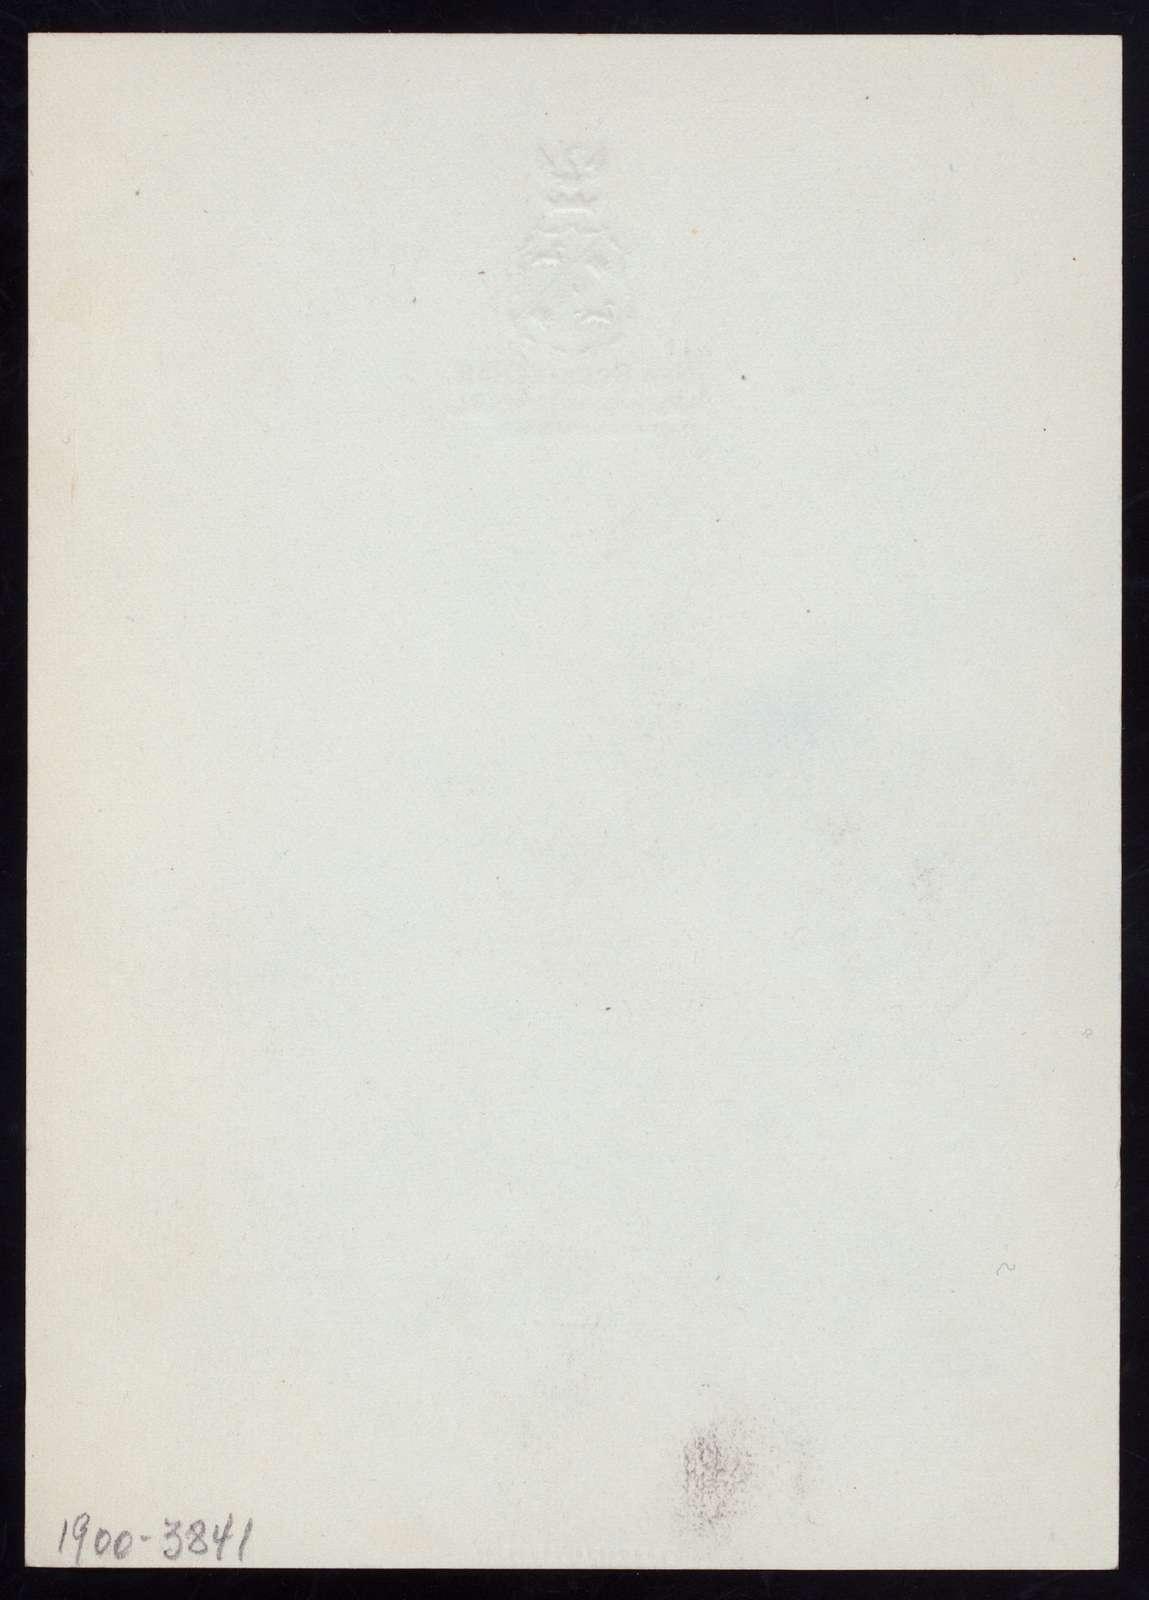 "LUNCHEON [held by] NEW ROCKINGHAM [at] ""NARRAGANSETT PIER,RI"" (HOTEL?;)"